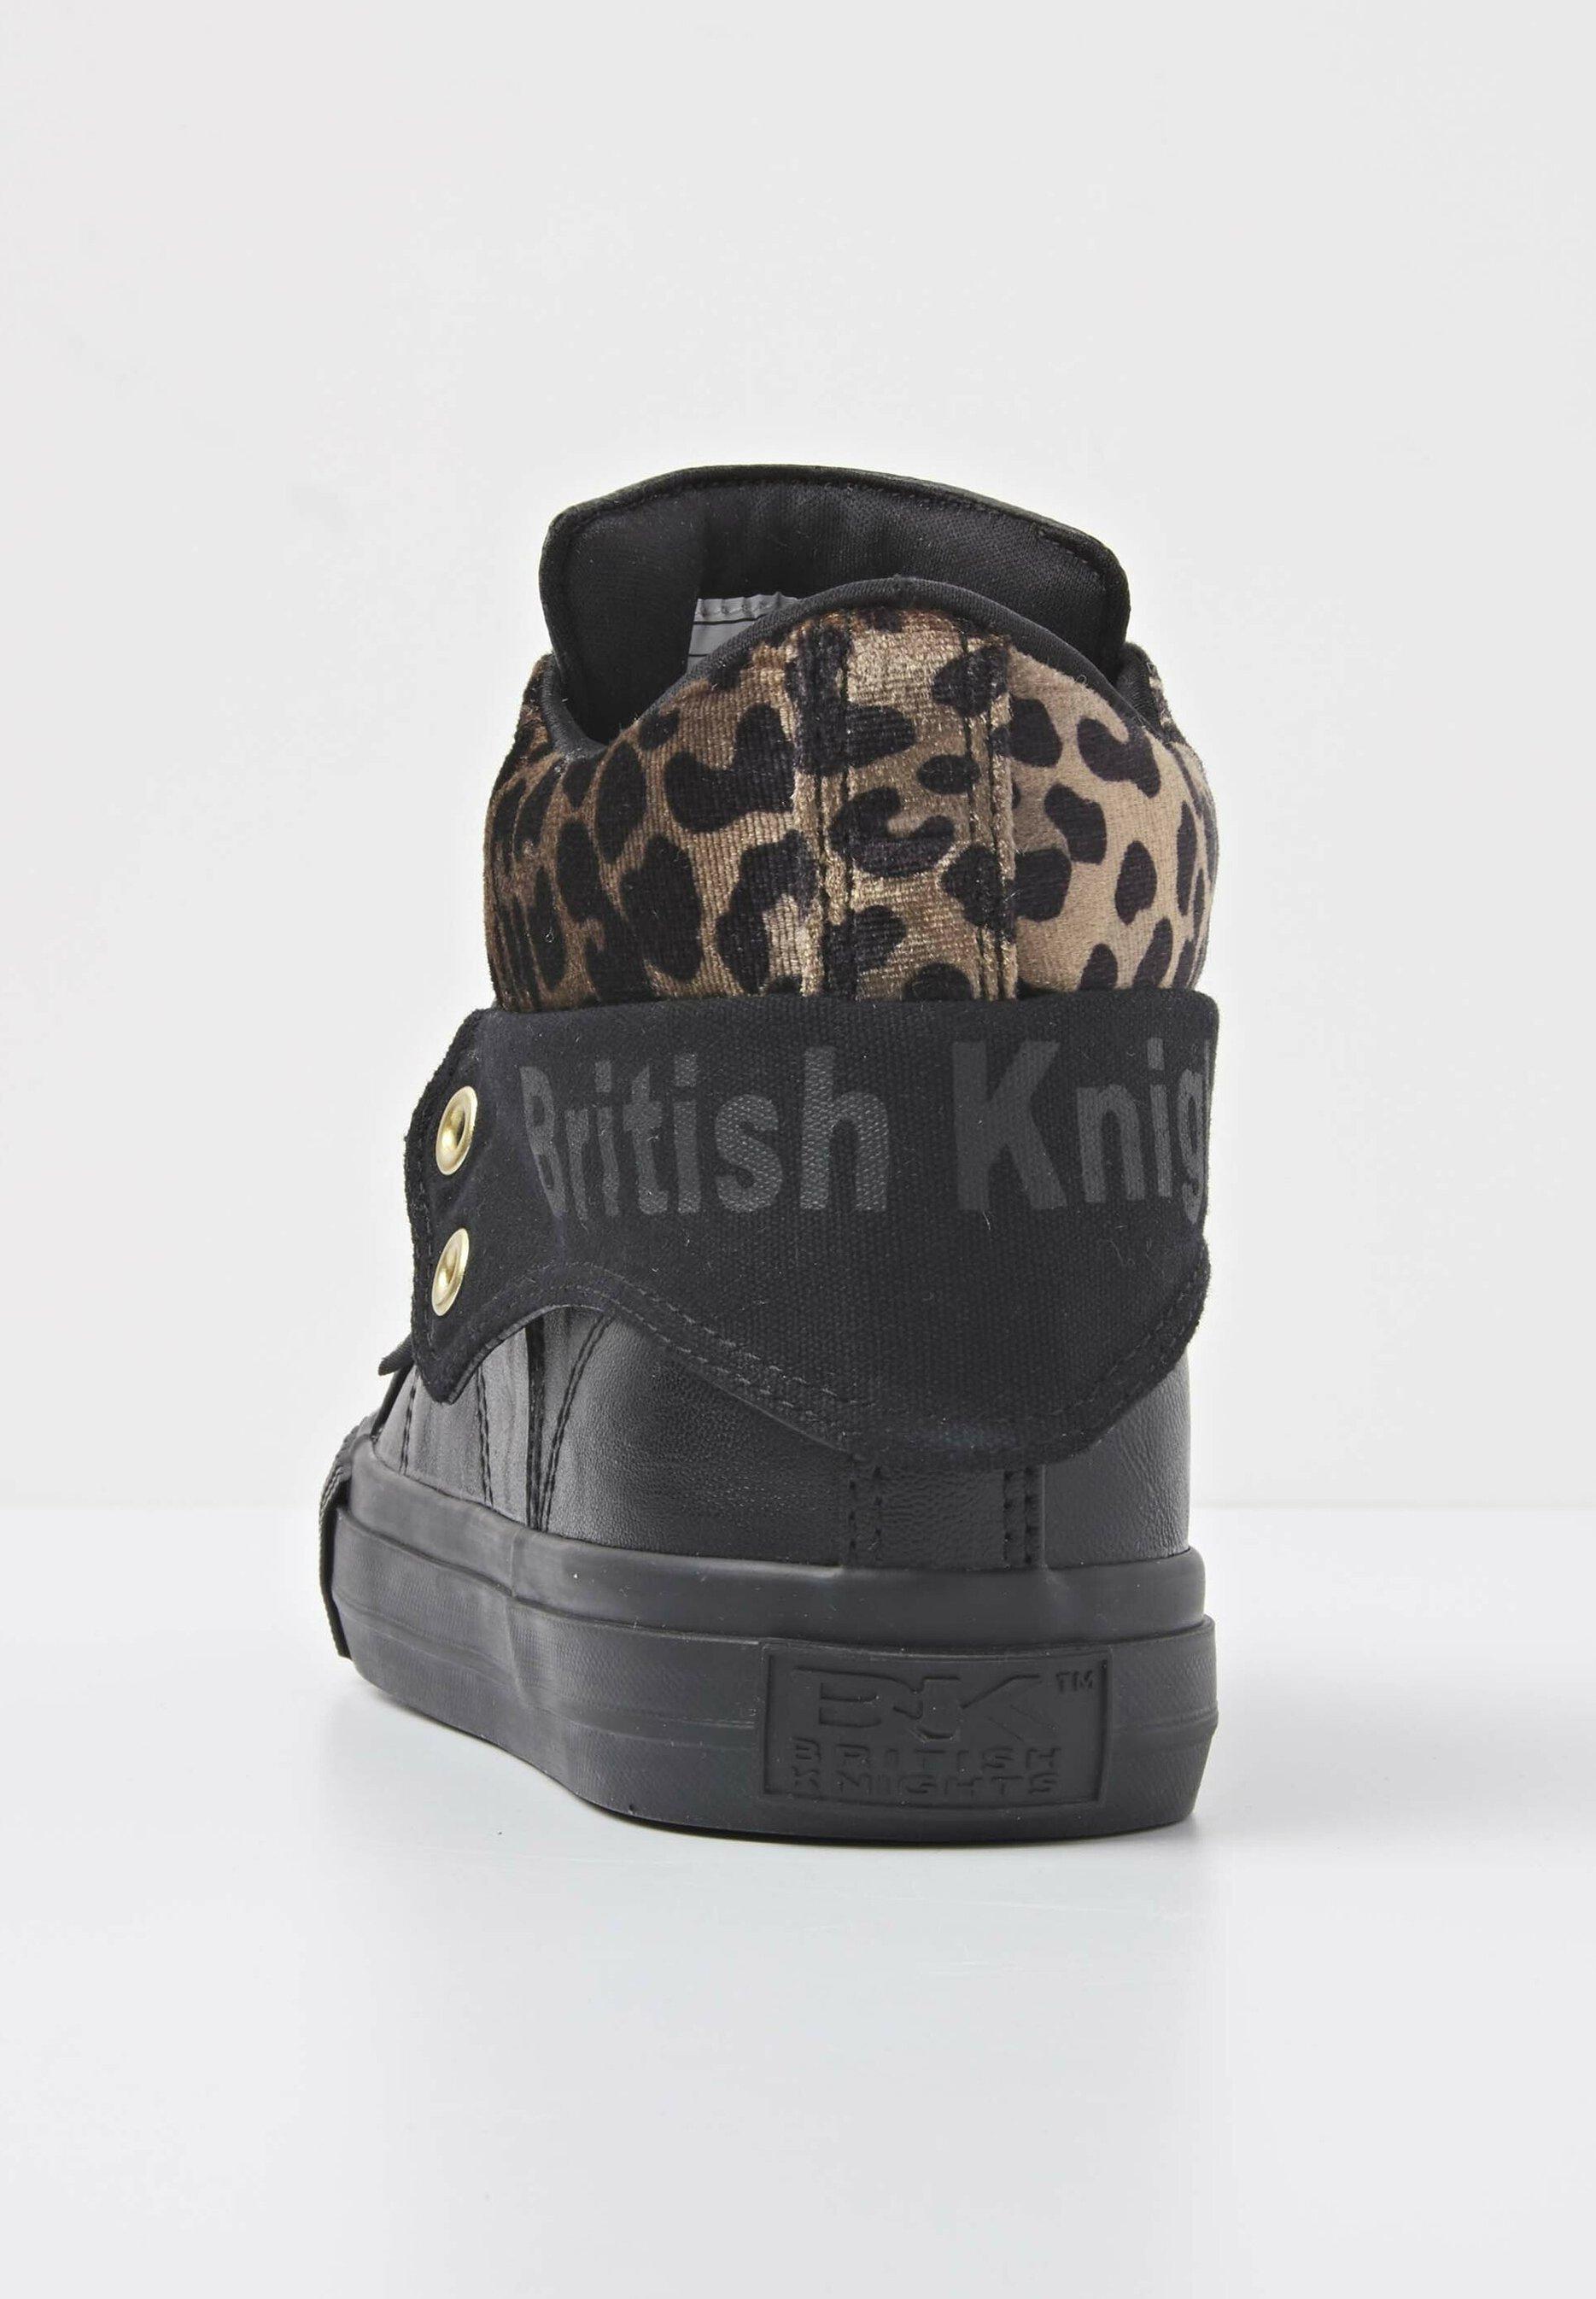 British Knights SNEAKER ROCO Sneaker high black/rust leopard/gold/black/schwarz